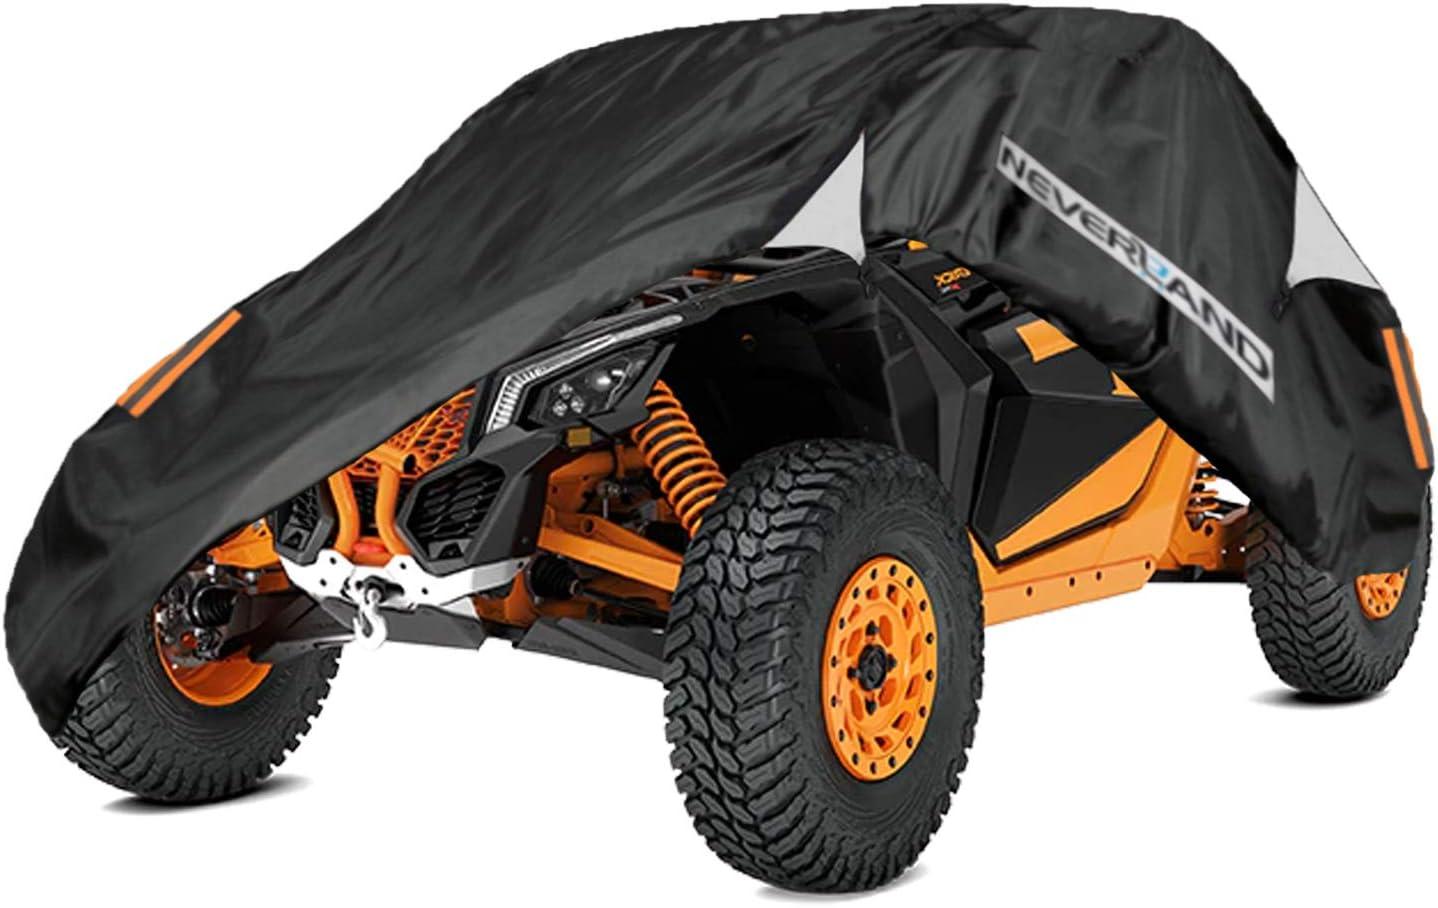 Storage Sun-UV Rain Snow Protector Universal for Can-Am Maverick X3 XMR//XRC//Turbo//900 HO//R//X DS Turbo R//X RC Turbo R//X RS Turbo R//X MR Turbo R Except Max series NEVERLAND UTV Covers